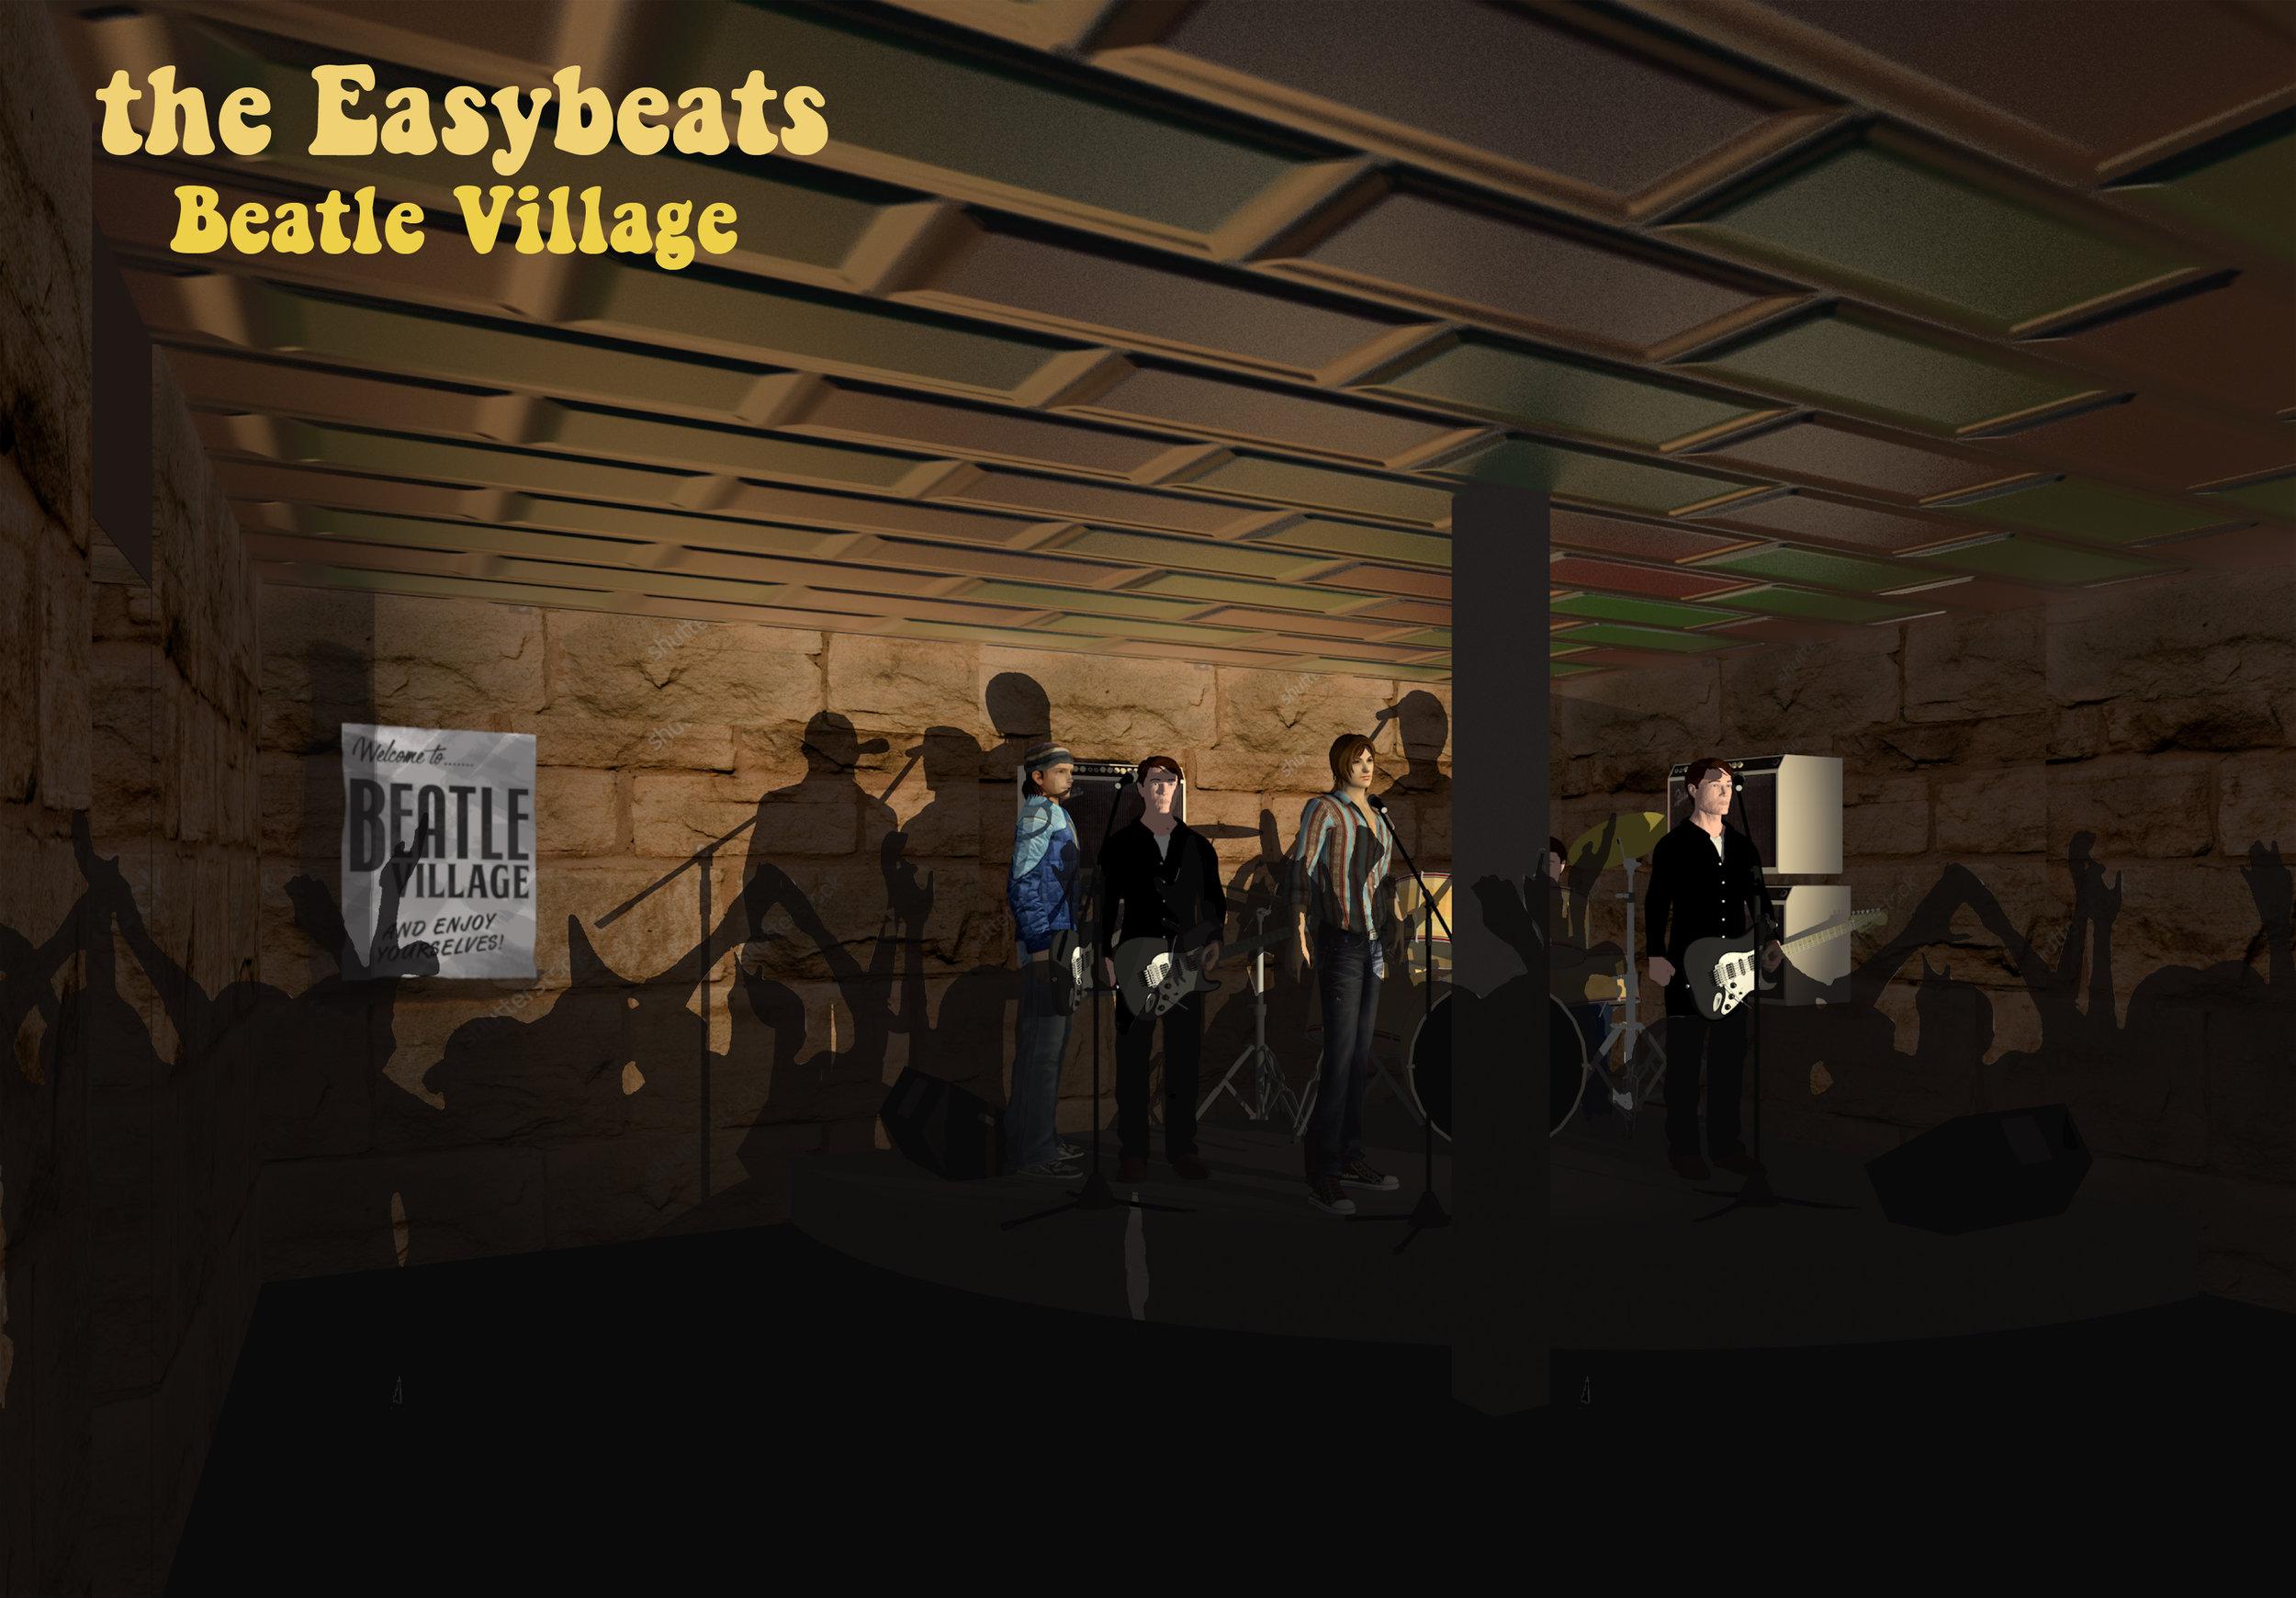 beatle village  STAGE  .jpg